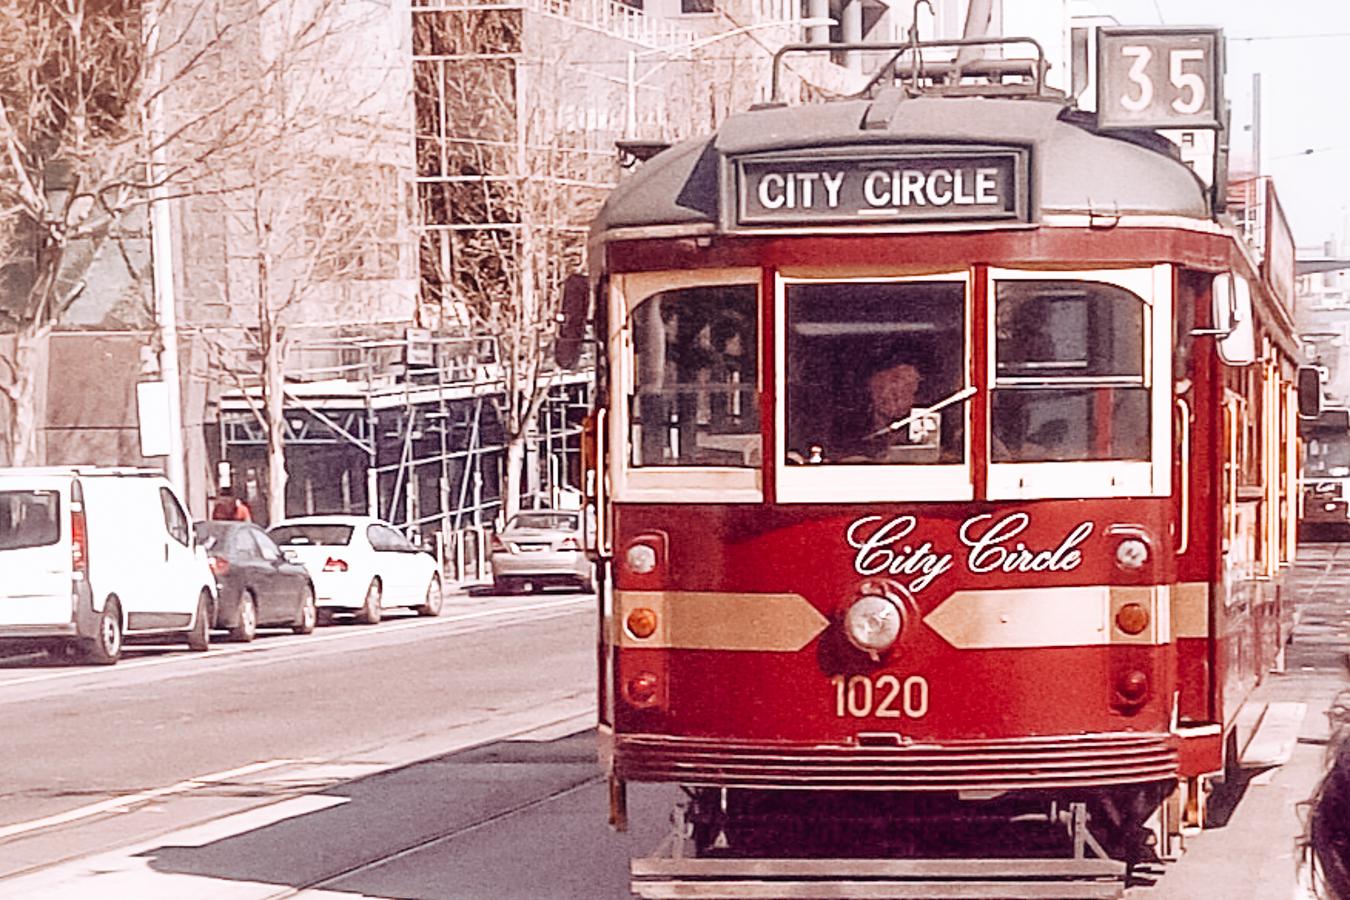 City Circle tram in Melbourne